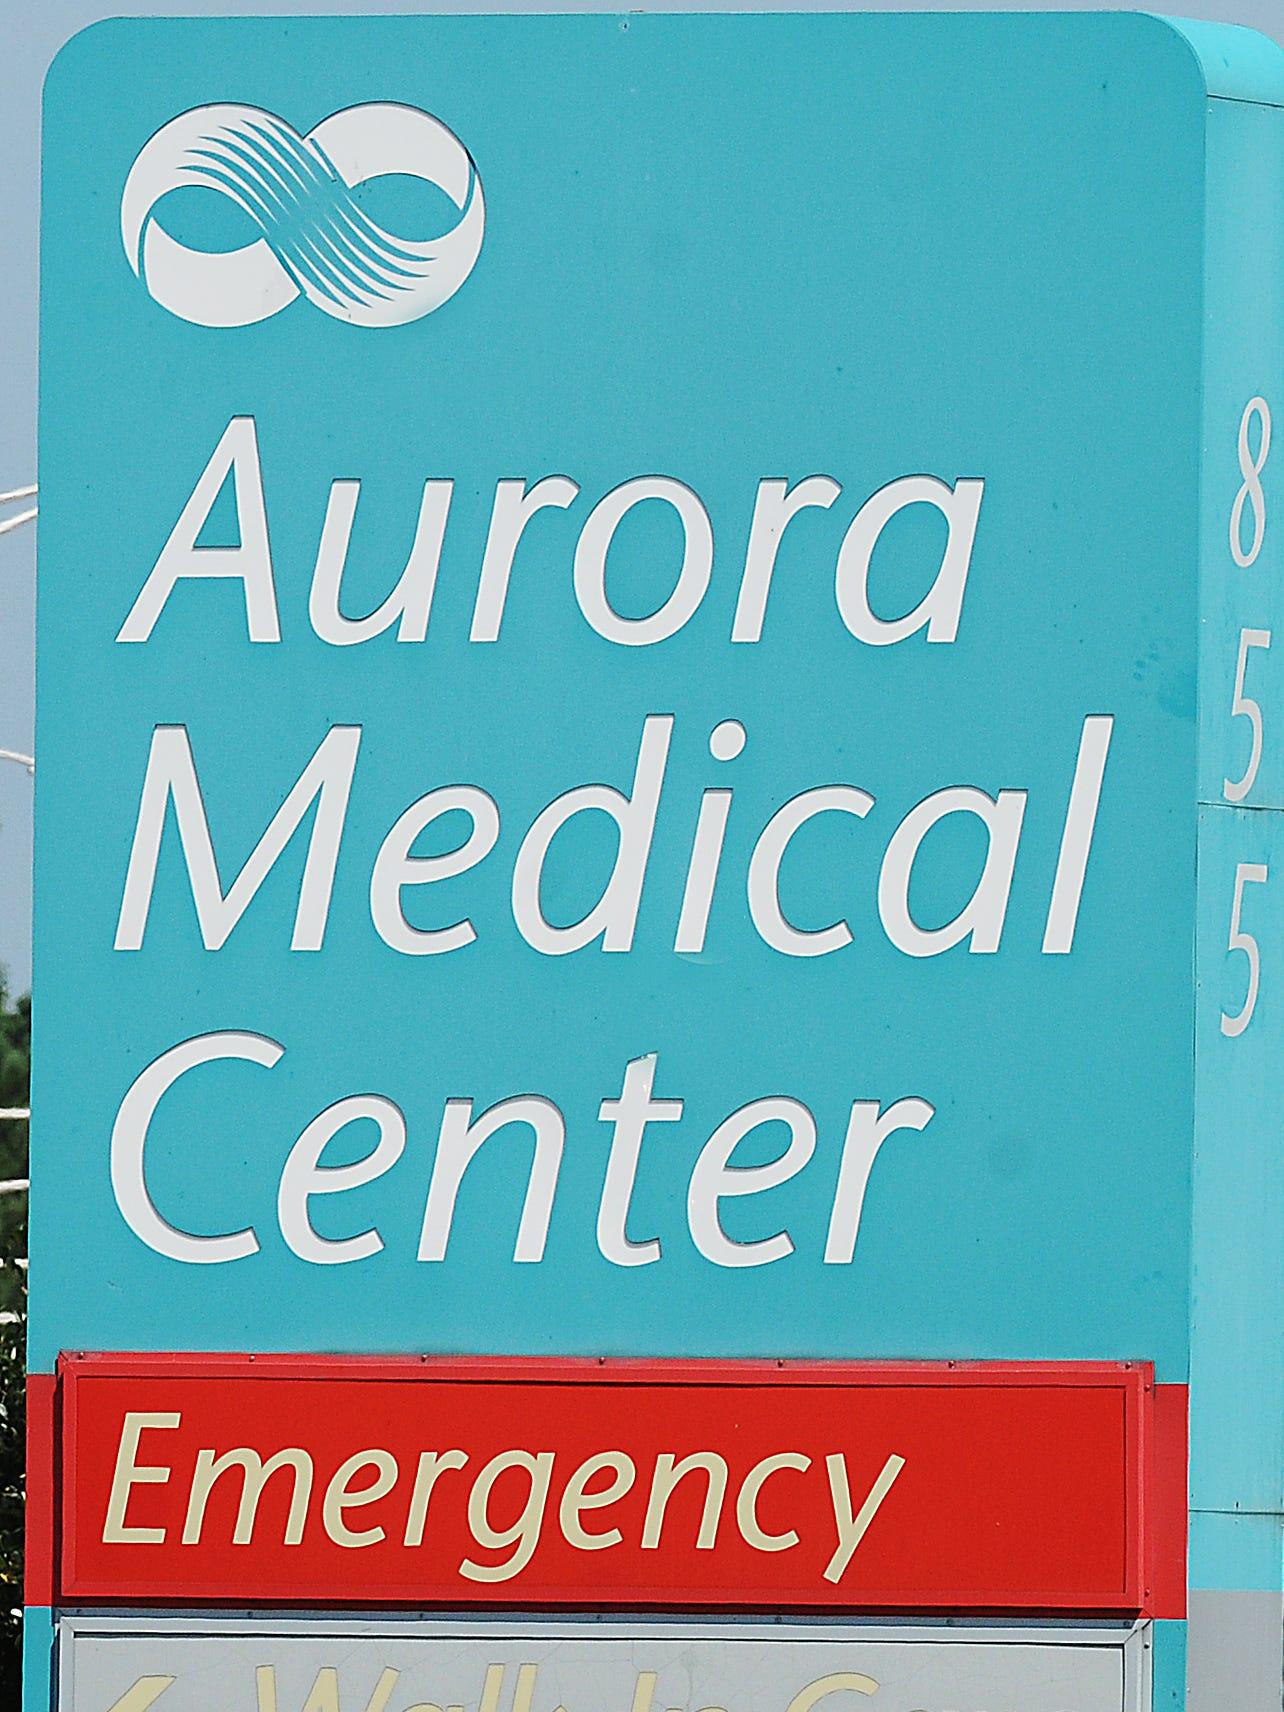 Aurora Health Care Uw Oshkosh Partner To Educate Diverse Leaders